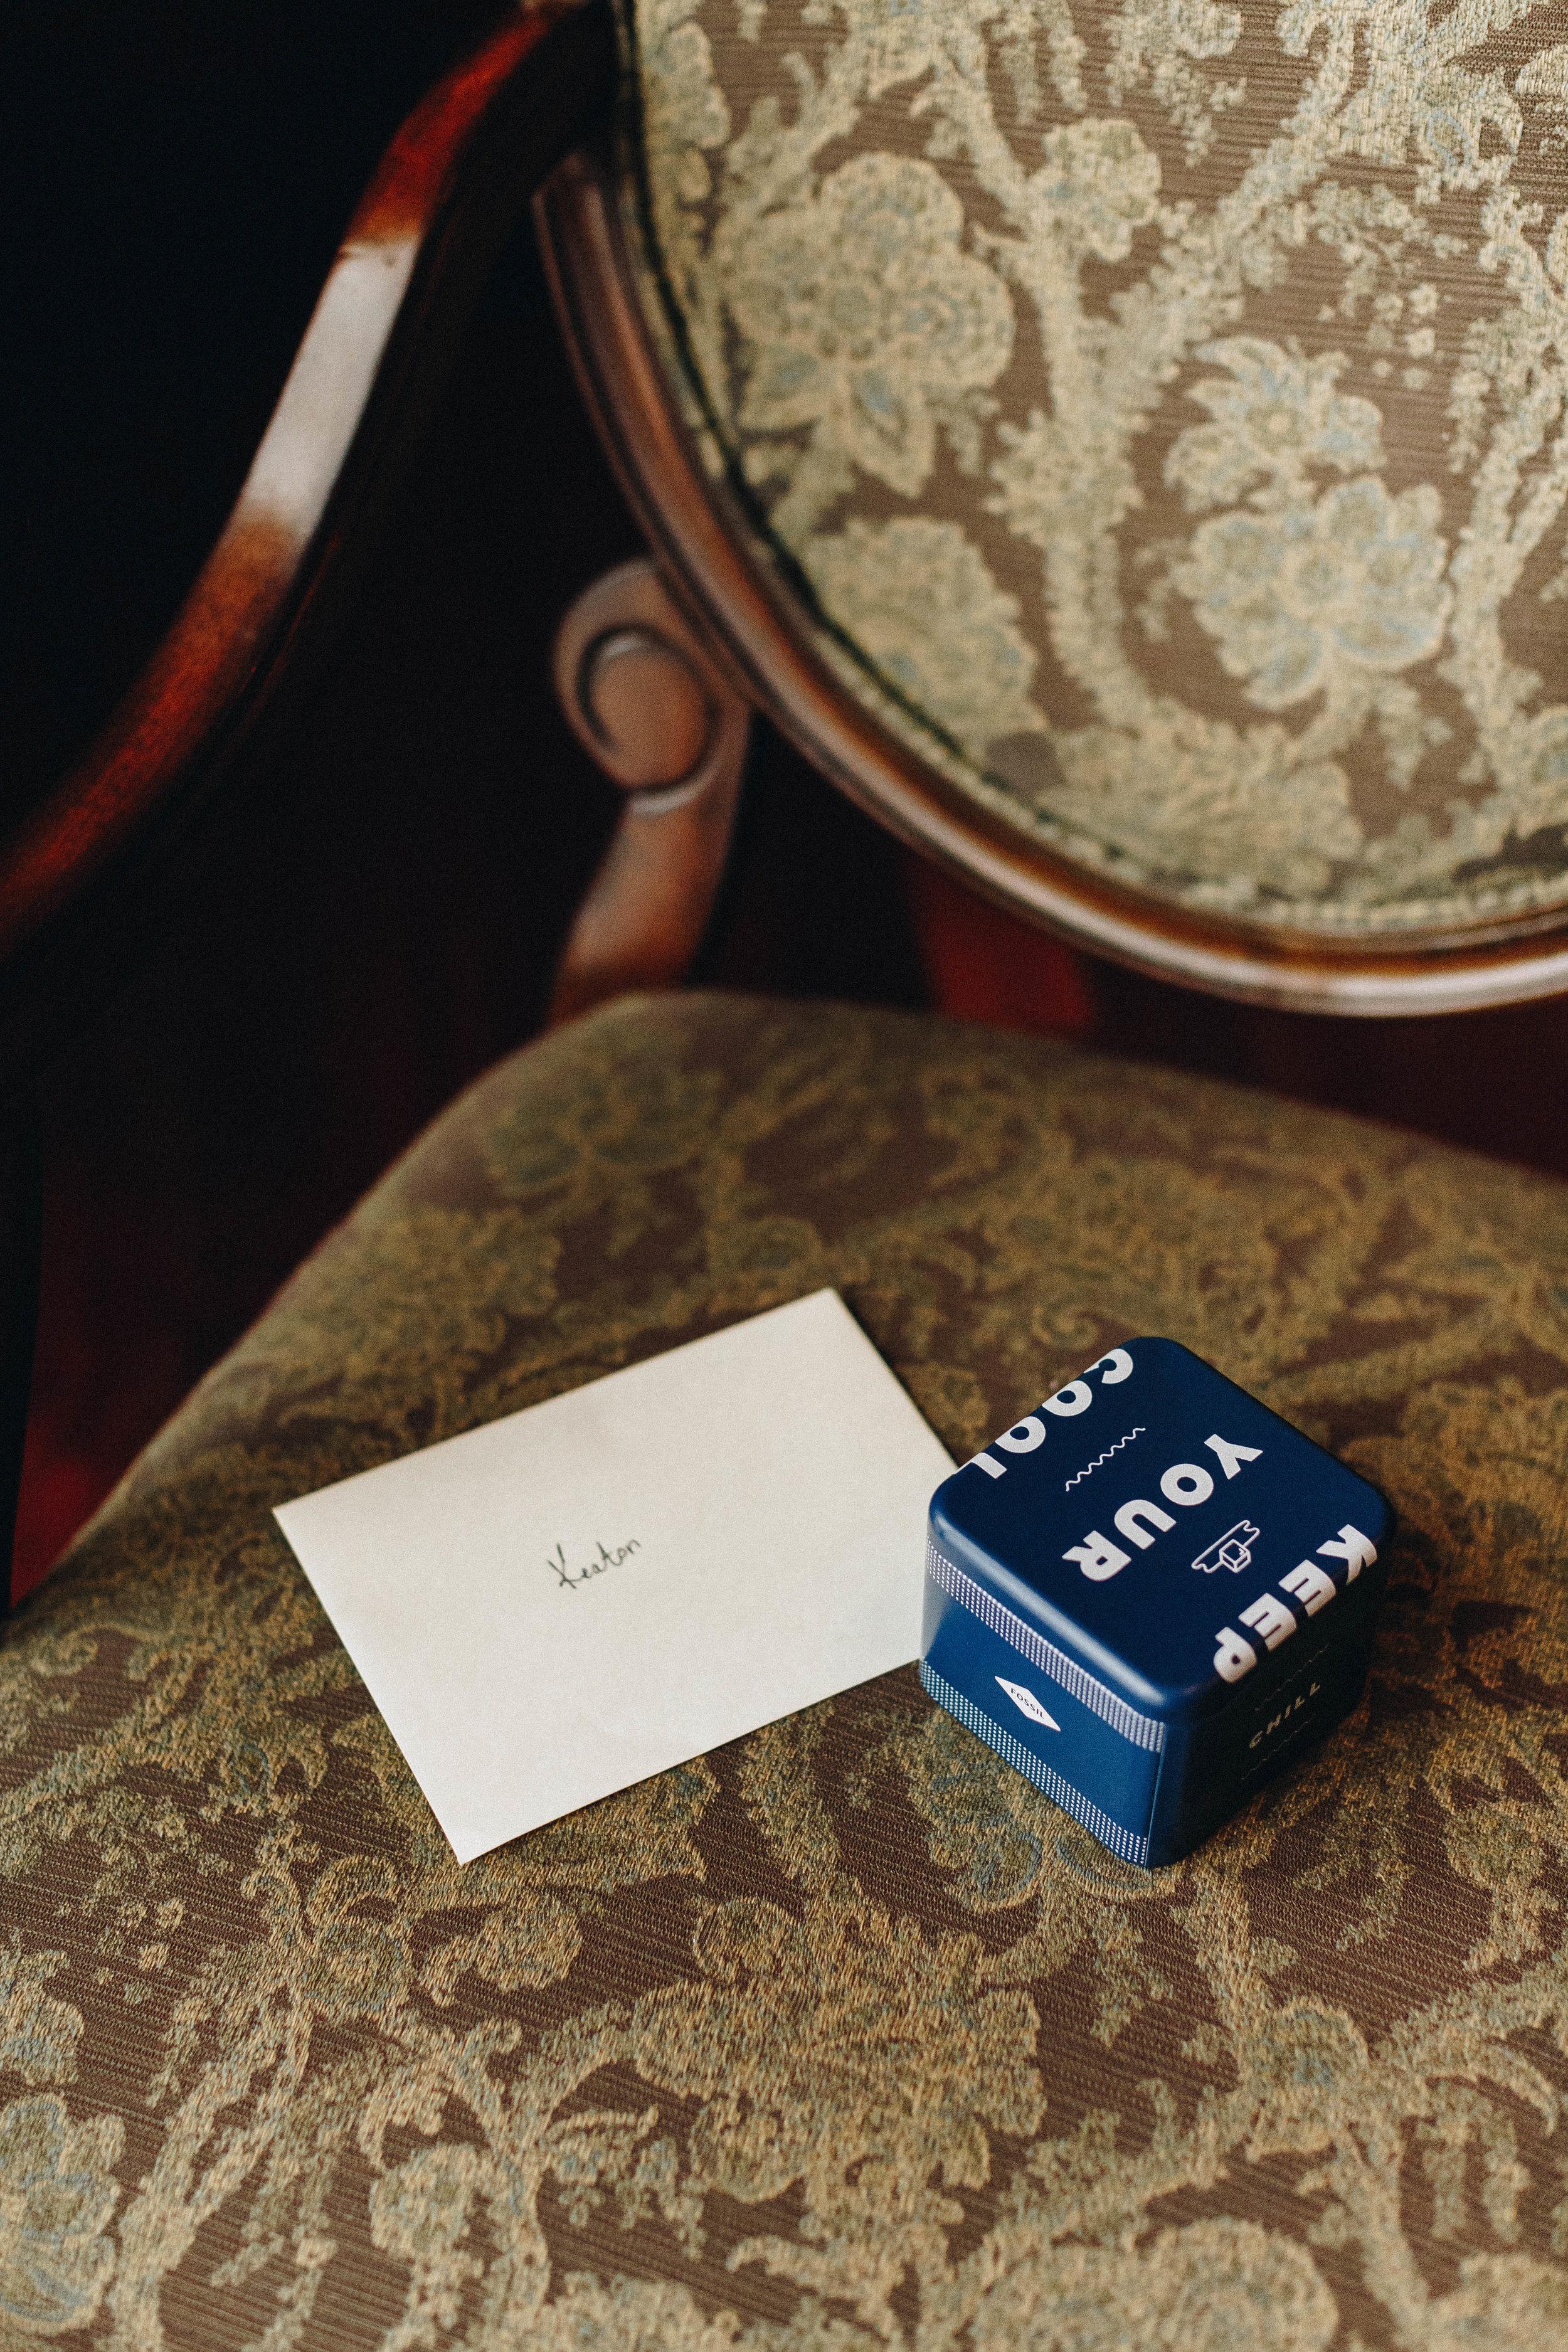 427ad-luxmoregrandestatewedding.jpgluxmoregrandestatewedding.jpg